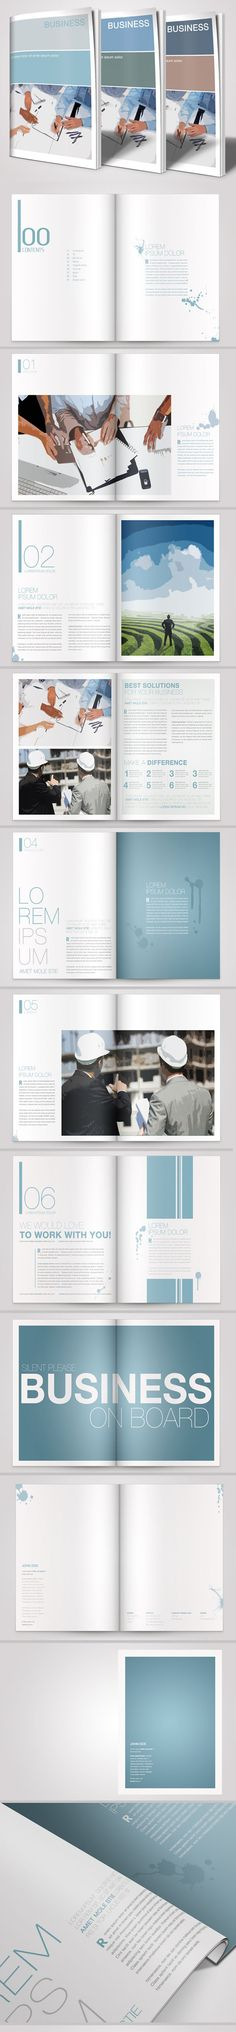 A4 Business Brochure Vol. 01 by Danijel Mokic, via Behance